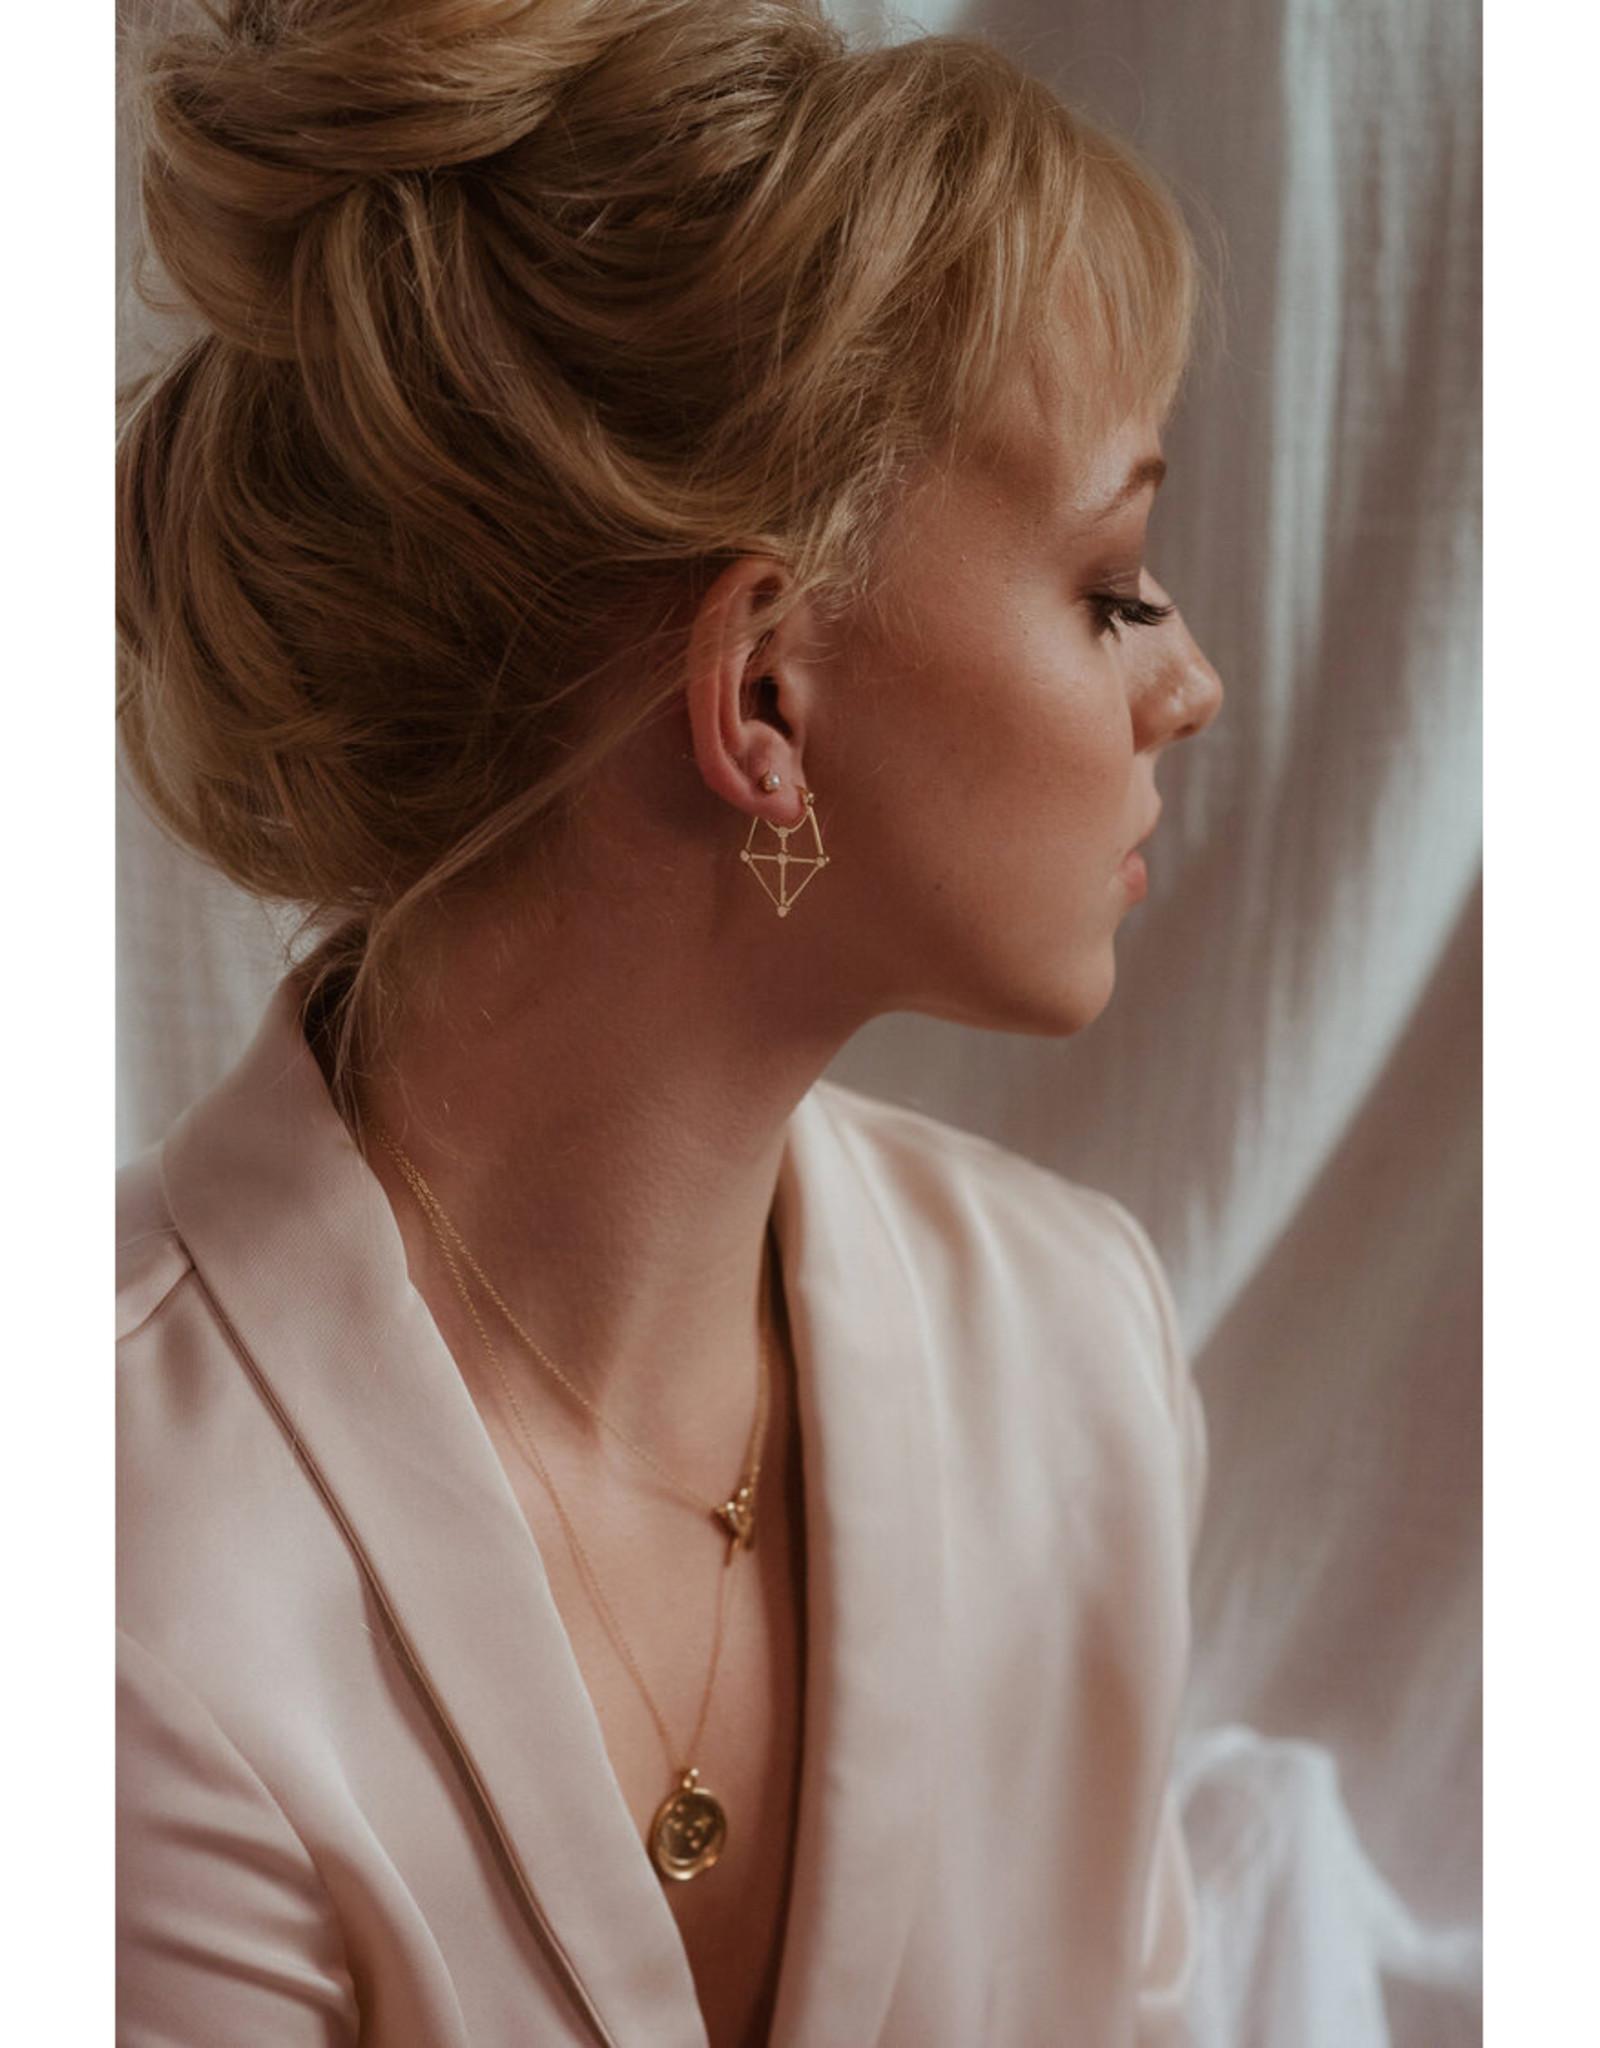 Sarah Mulder Jewelry Silver Cassie Studs - Rose Quartz